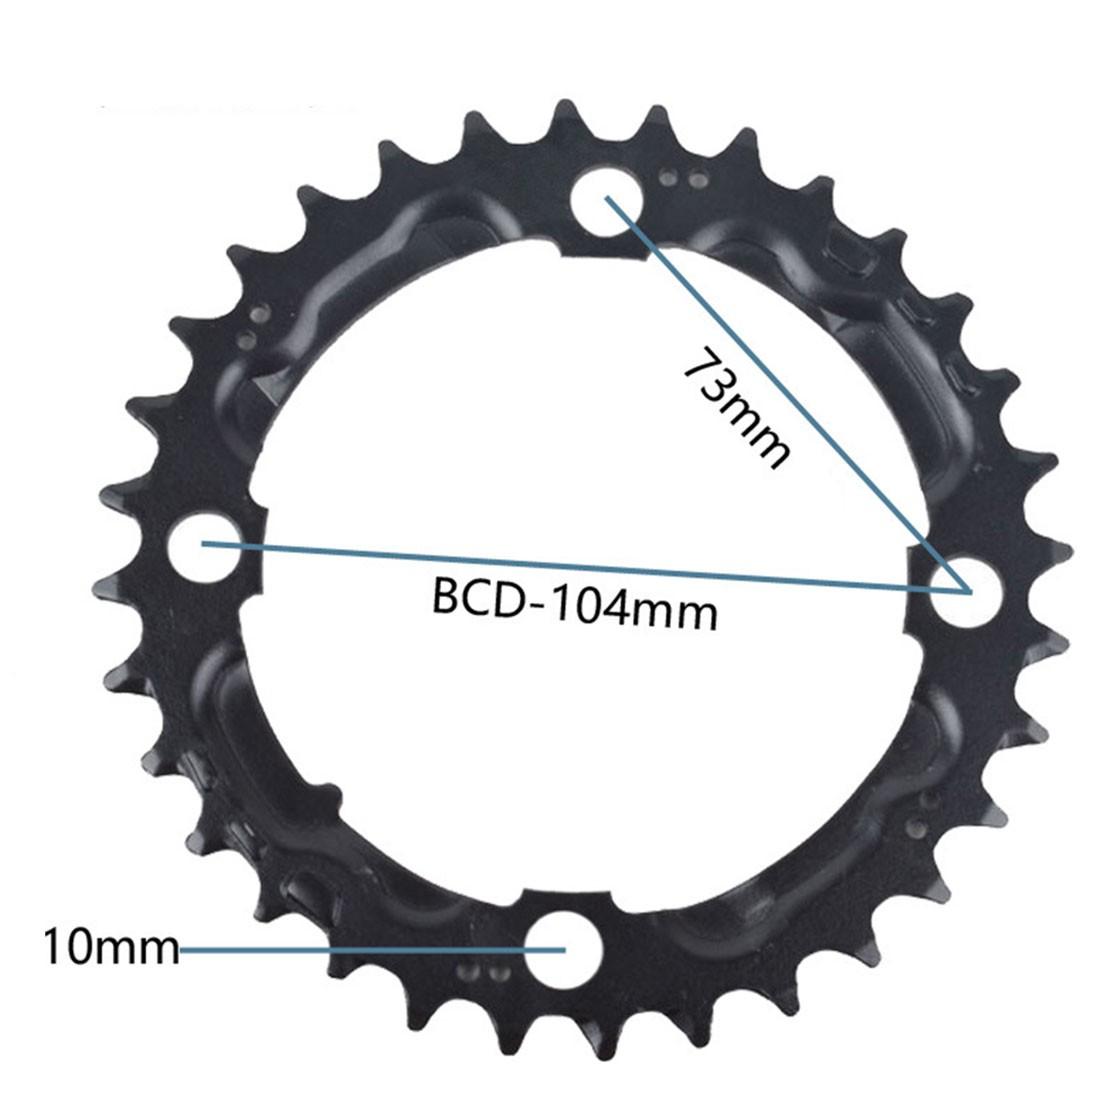 Details about  /8.5mm MTB Chainring Bolt Chainwheel Crew Crank Screws Mountain Bike Accessories